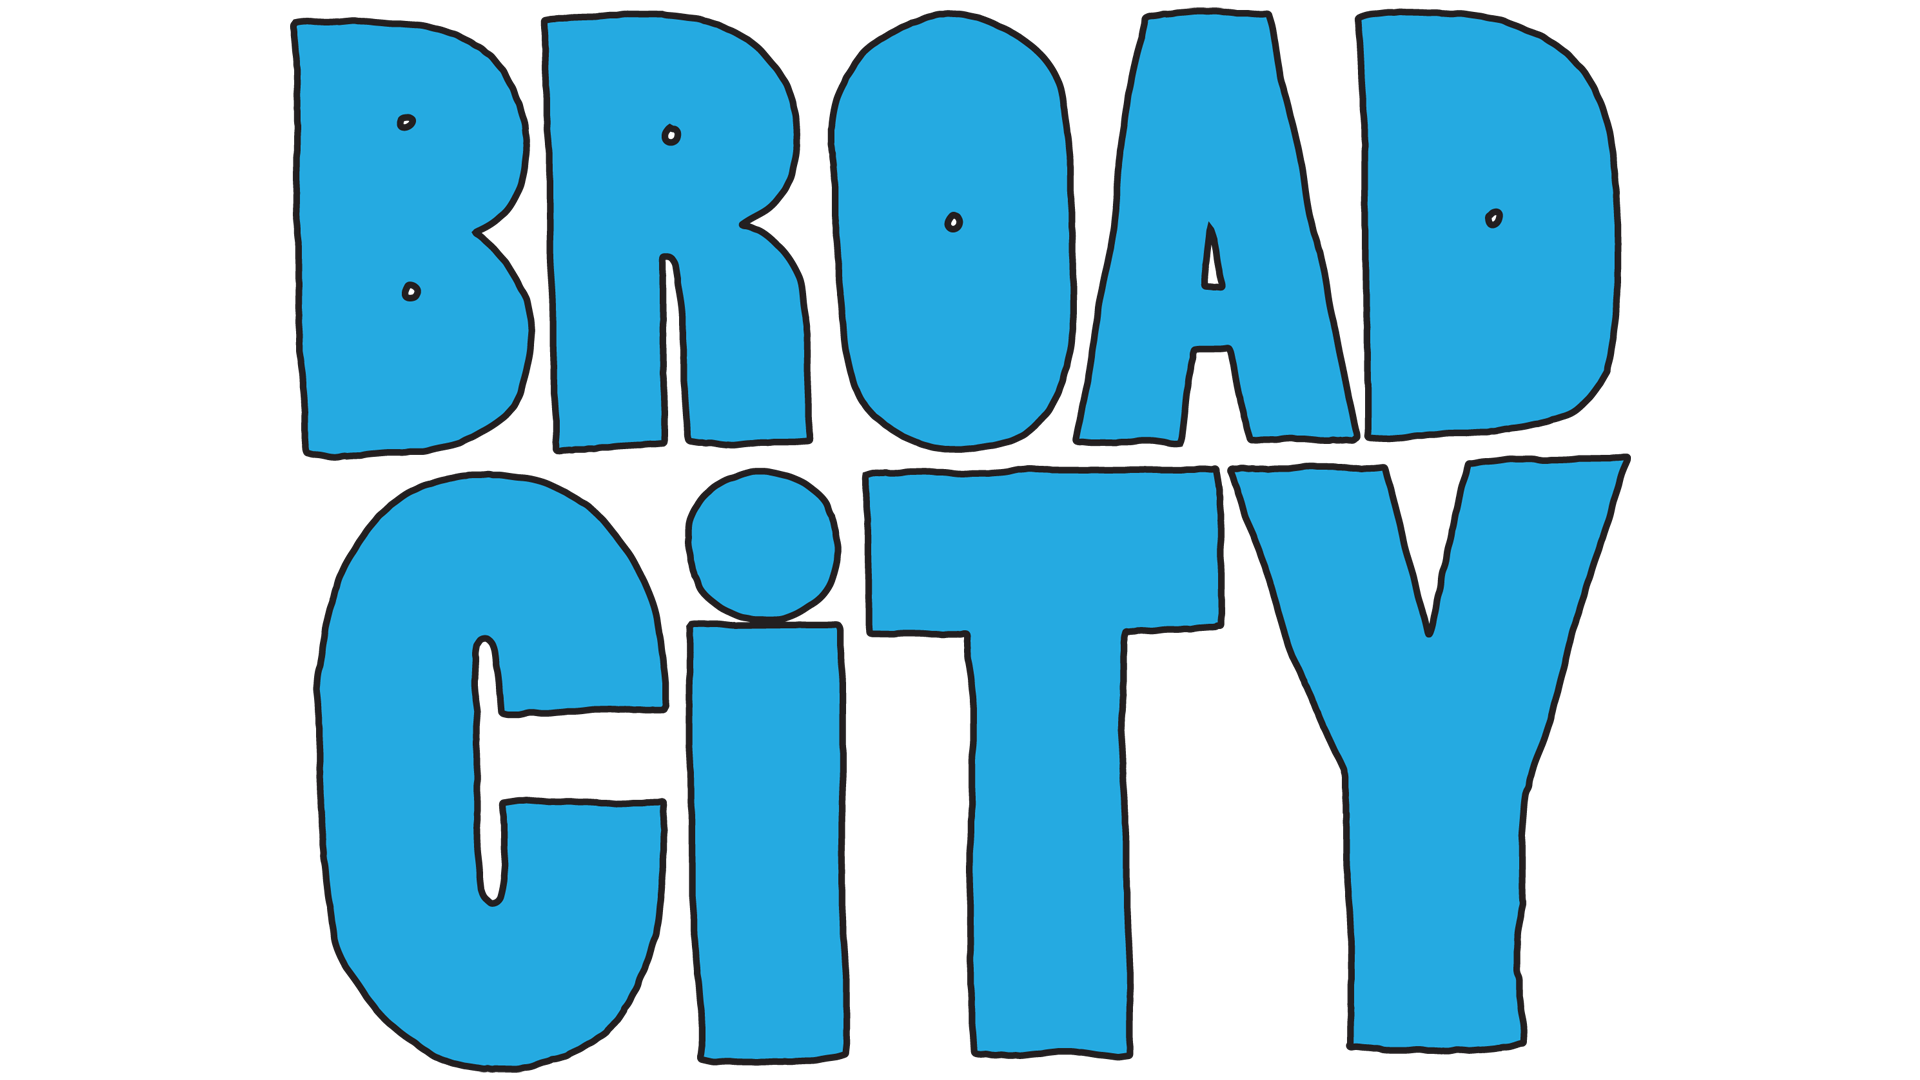 broadcity_ldl.png (1920×1080) Gaming logos, Broad city